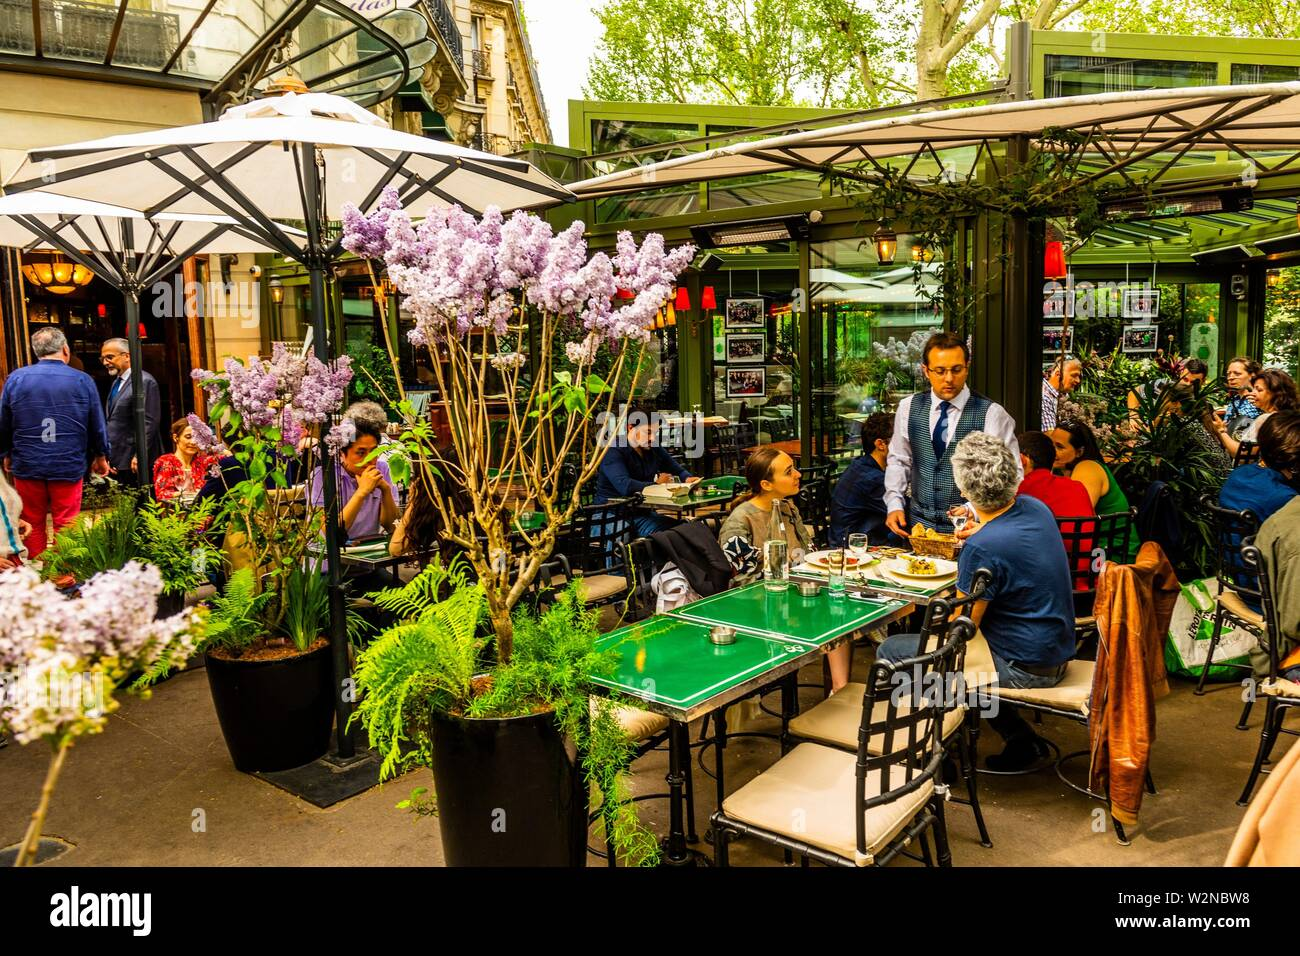 Planter Un Lilas En Pot namesake stock photos & namesake stock images - alamy